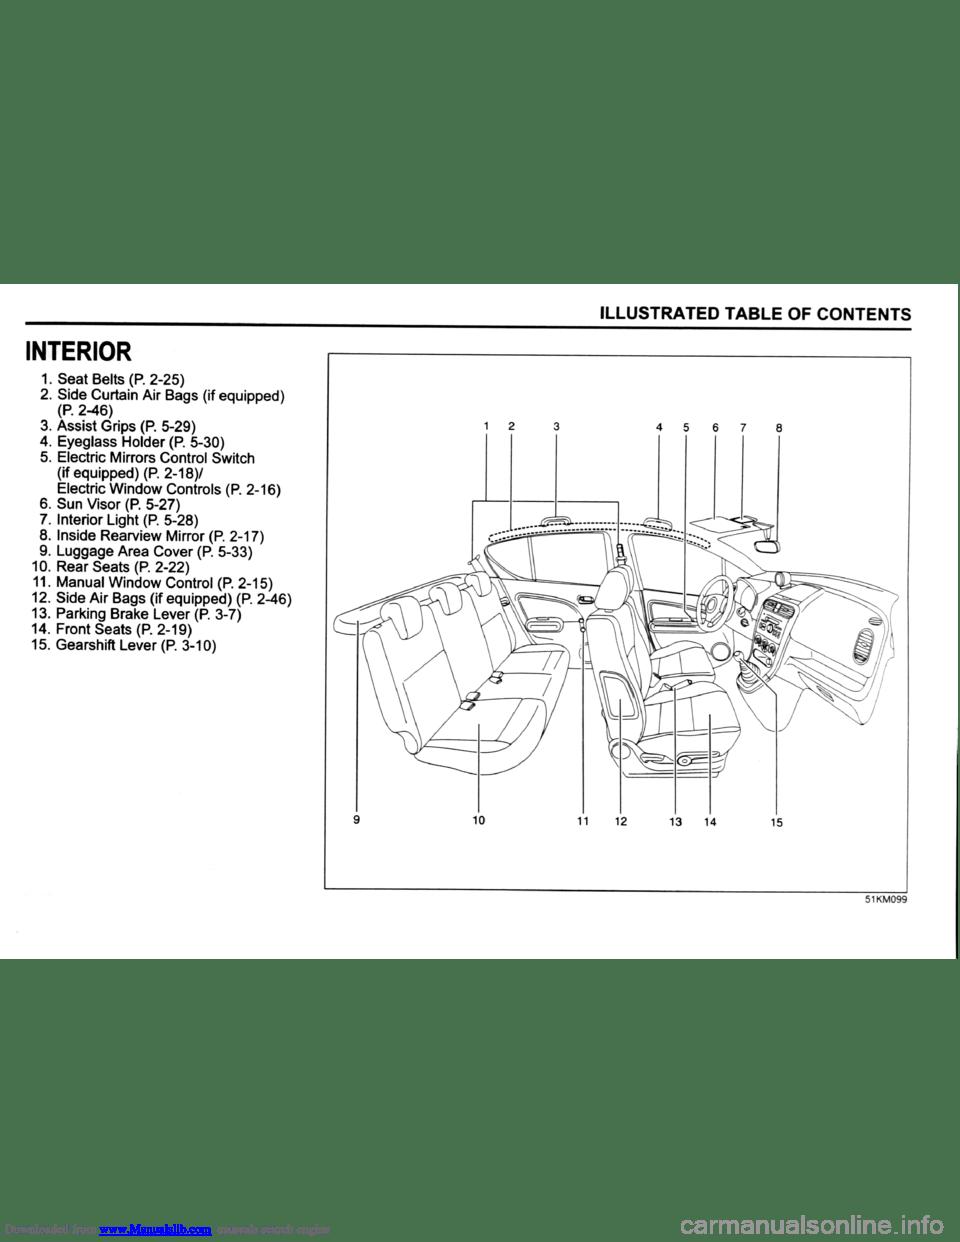 SUZUKI SPLASH 2005 1.G Owners Manual